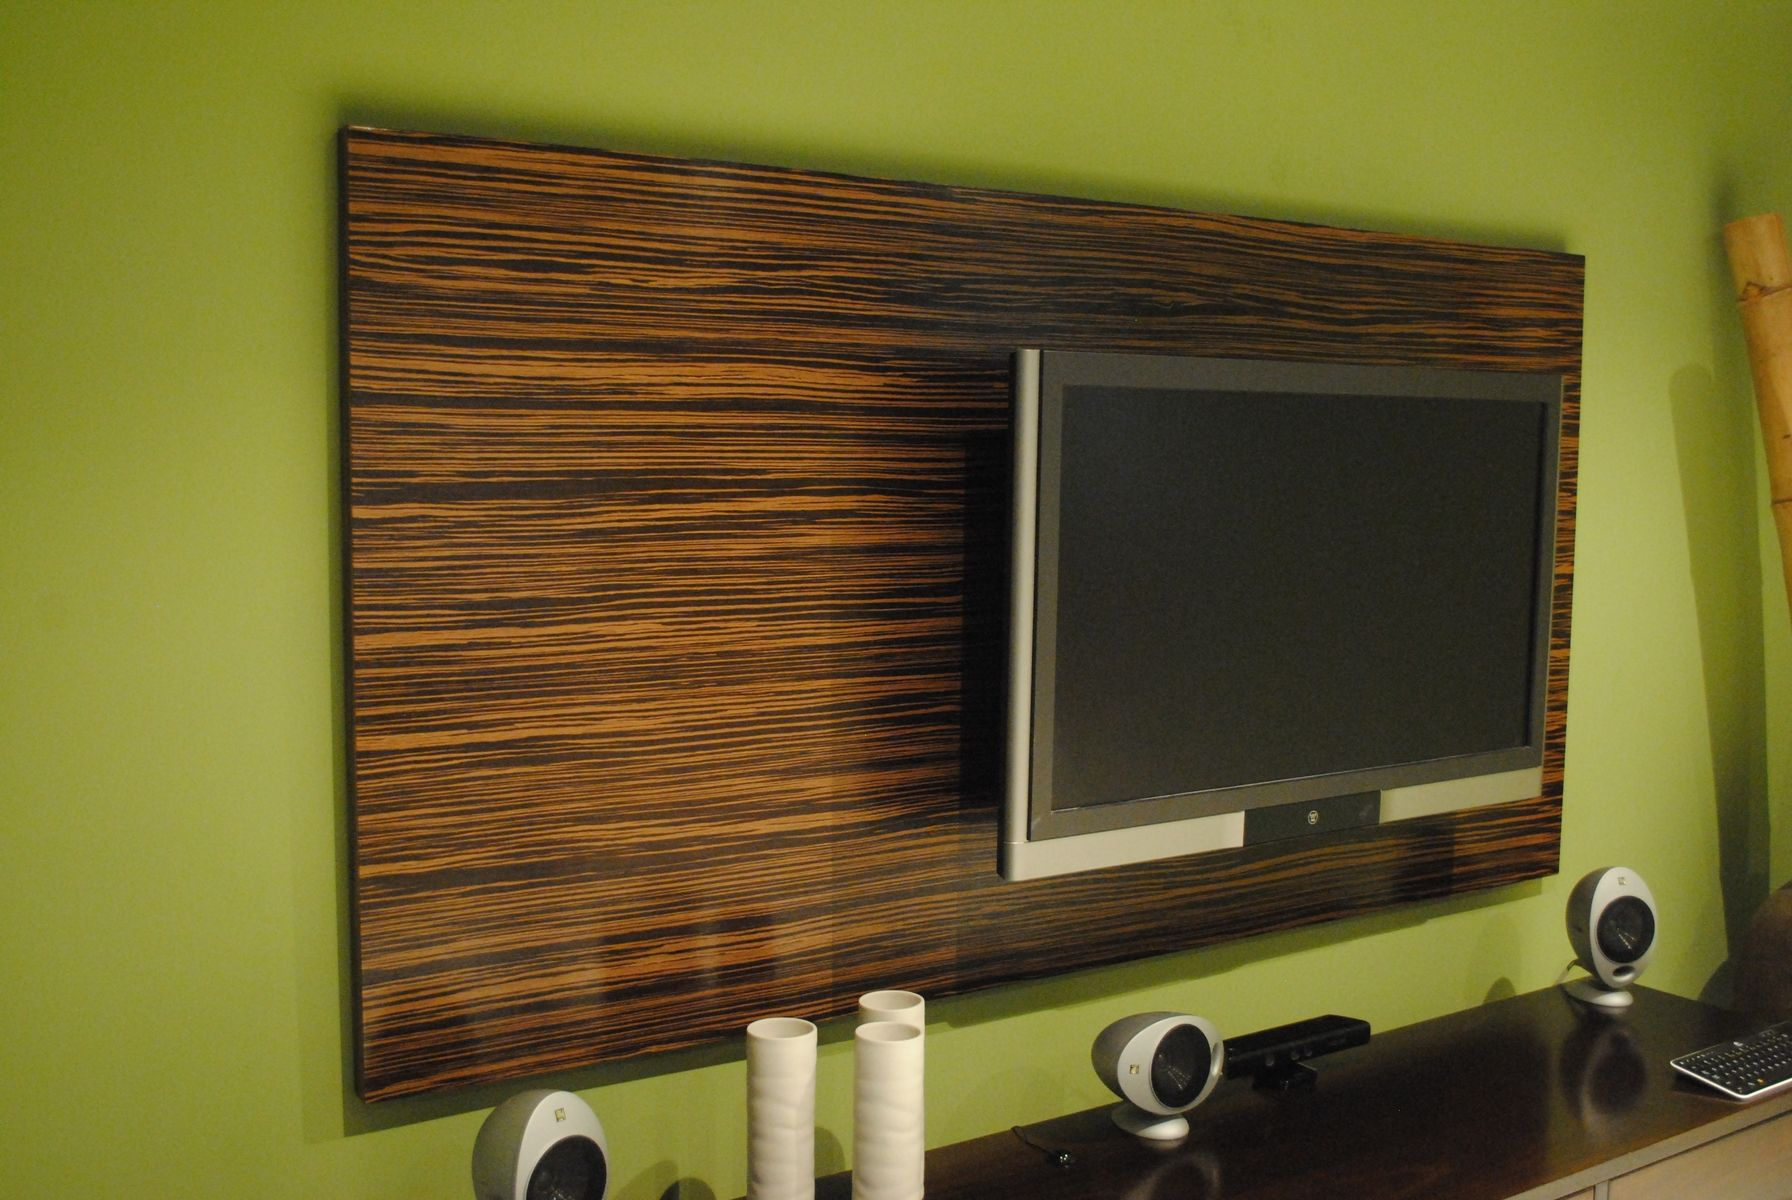 Macassar Ebony Wood Wall Tv Panel Wood Panel Walls Wood Wall Covering Modern Wall Paneling